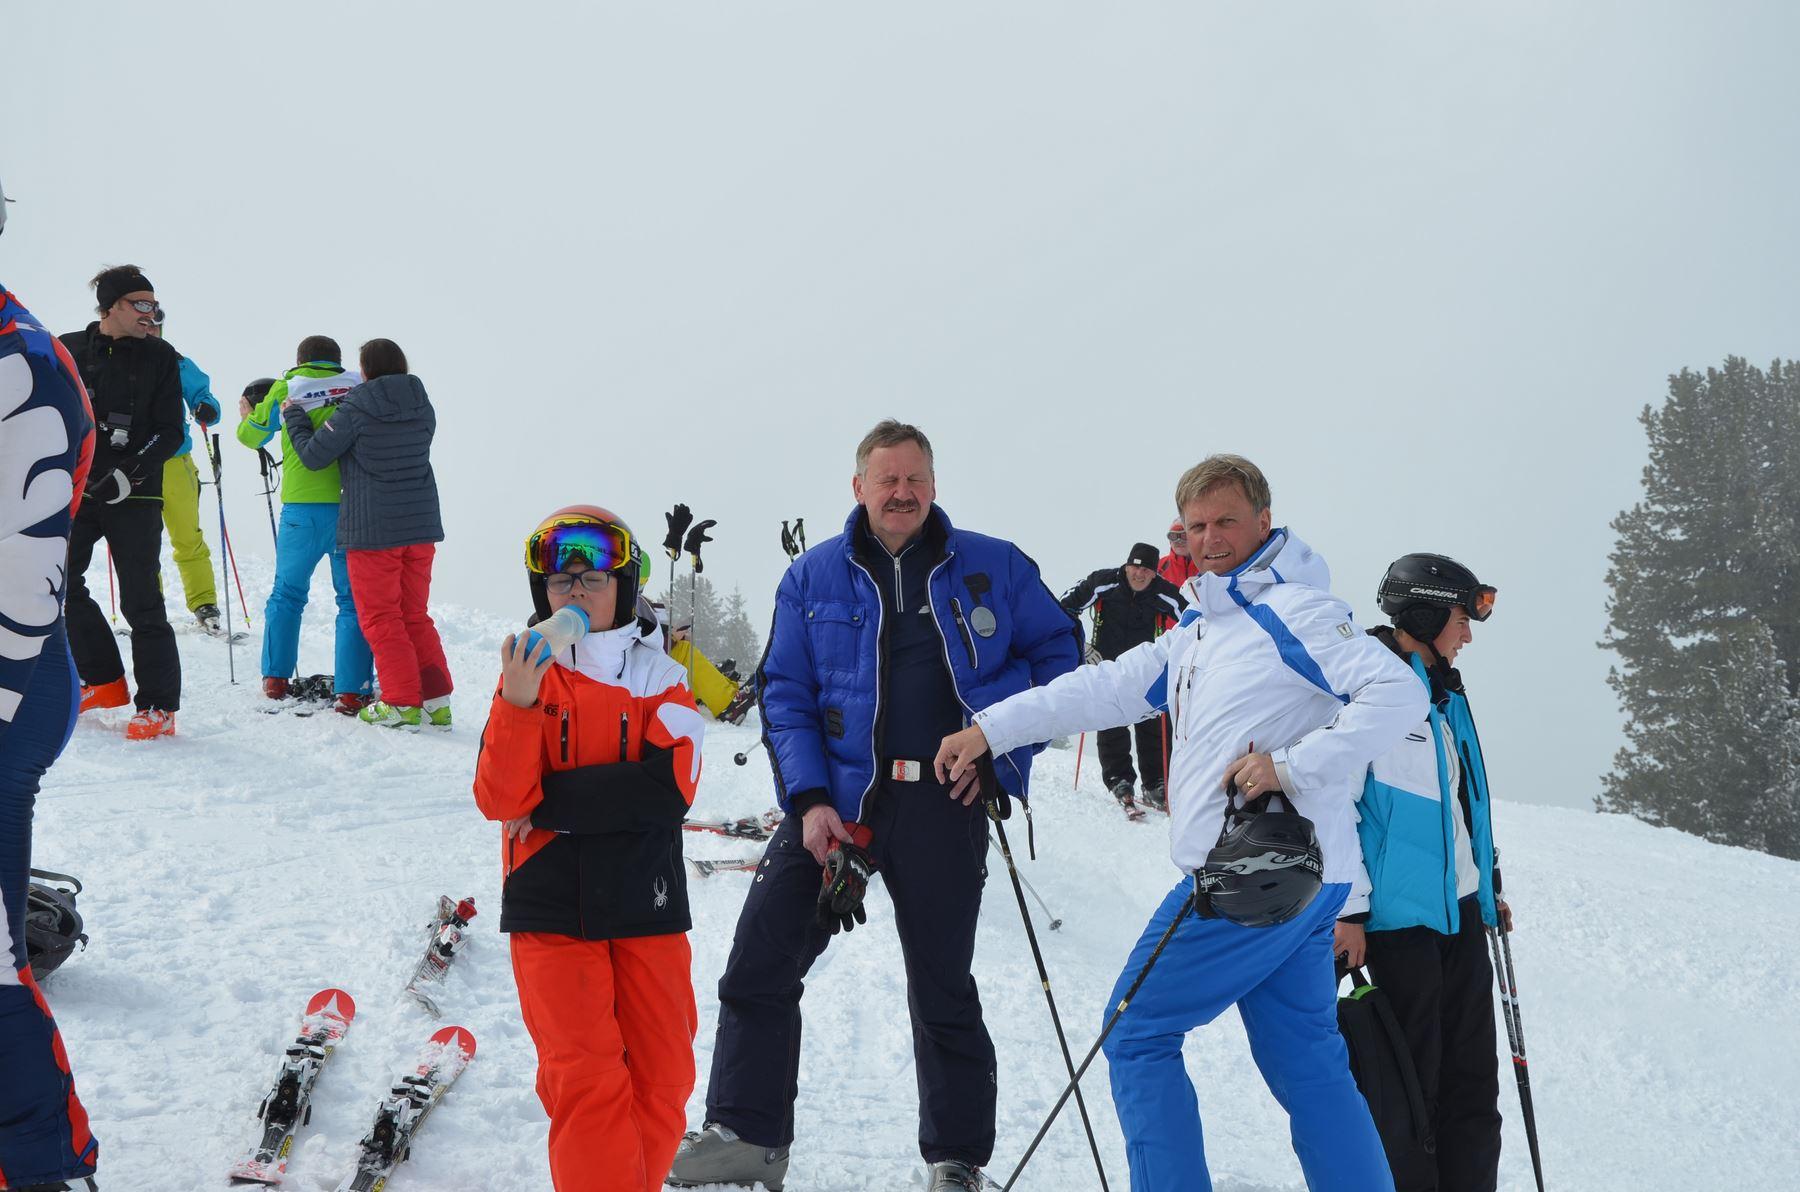 2015-03-22 BV Zillertal Skirennen 226.JPG